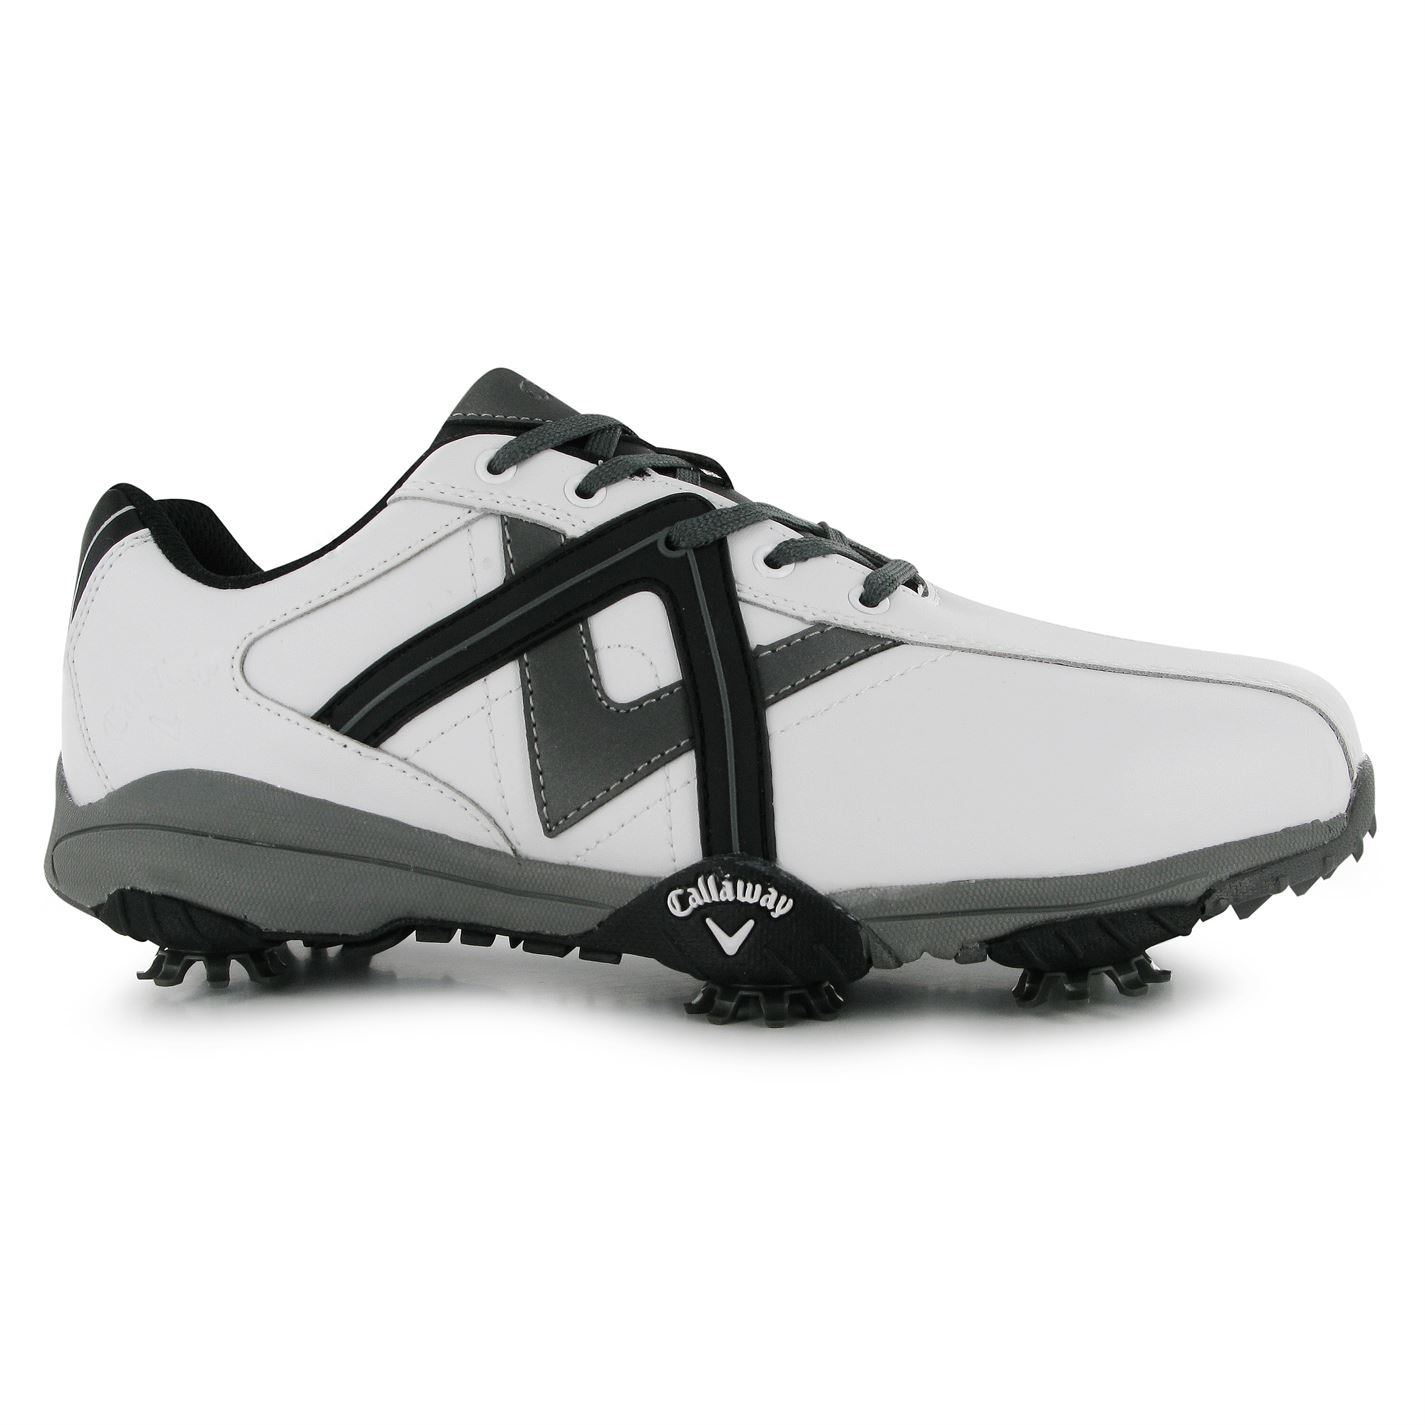 Callaway-Cheviot-ll-Golf-Shoes-Mens-Spikes-Footwear thumbnail 15